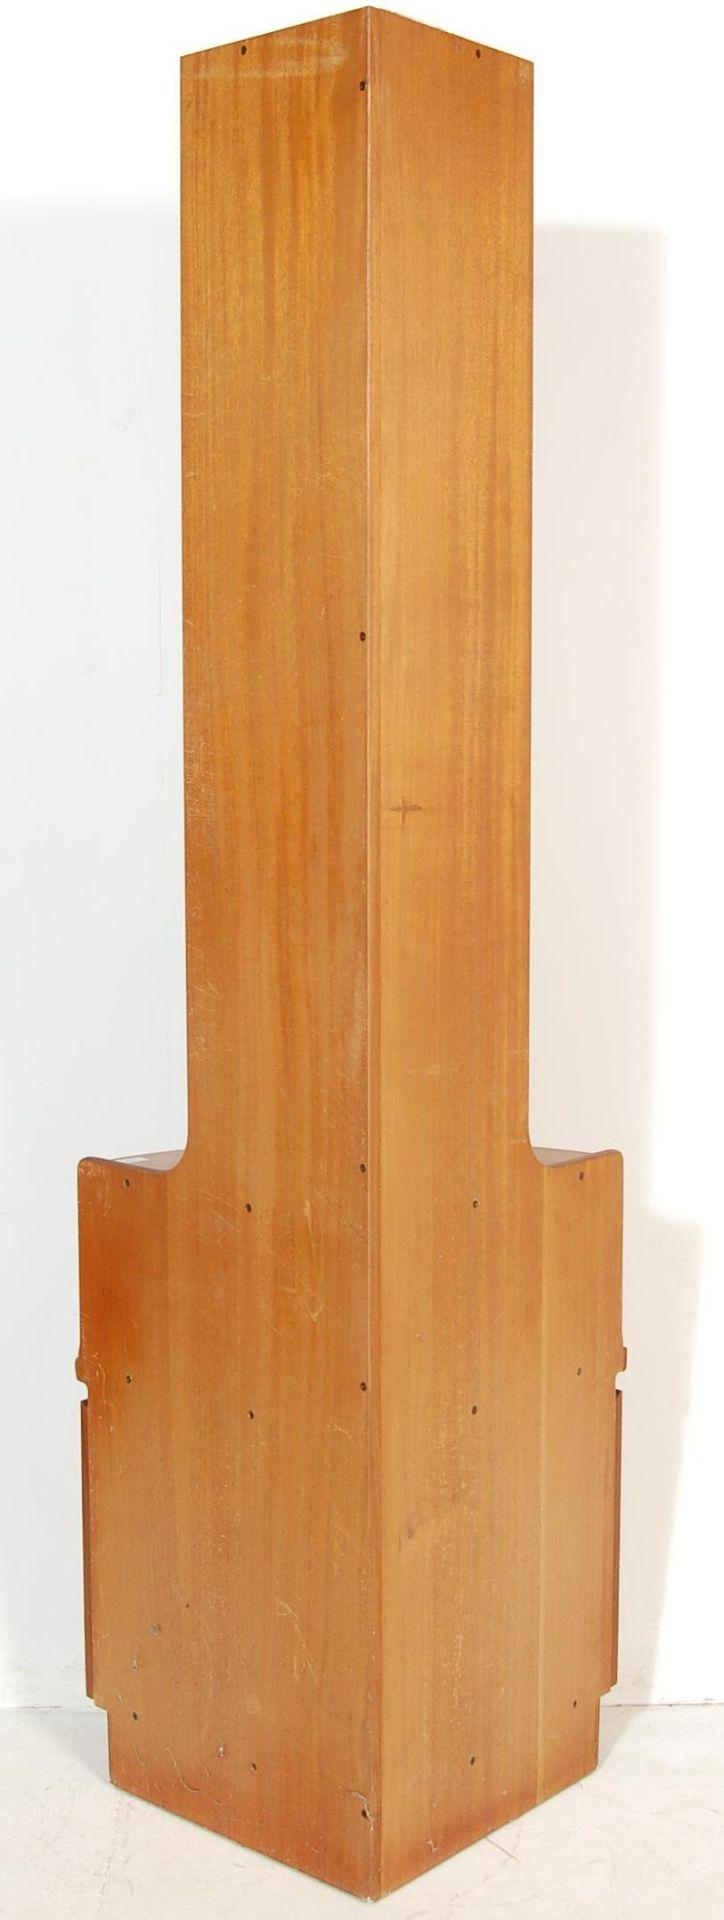 RETRO VINTAGE 20TH CENTURY TEAK WOOD CORNER CUPBOARD BY NATHAN - Image 5 of 5